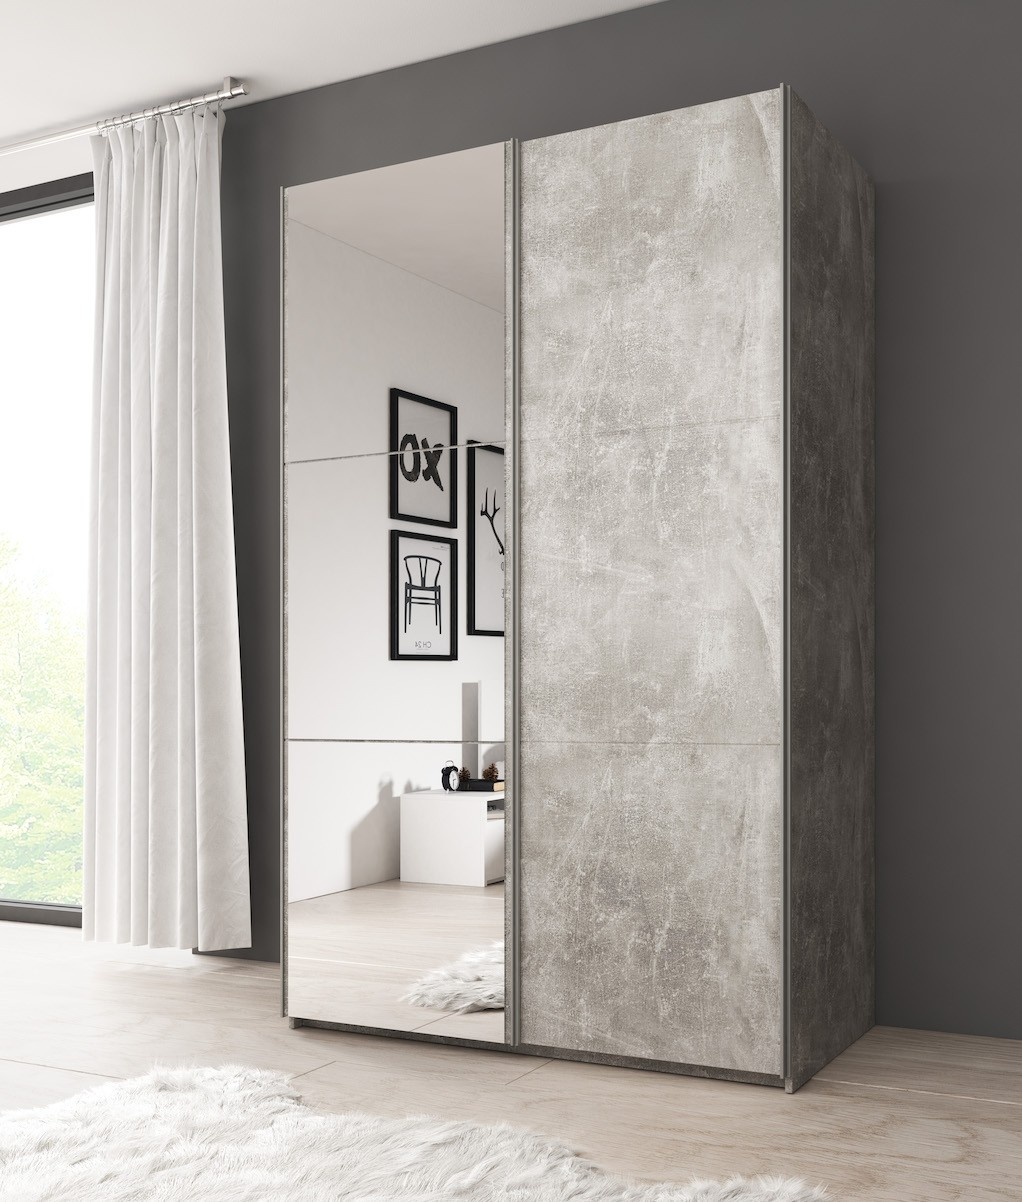 Kledingkast Toledo - Betonlook - 130 cm